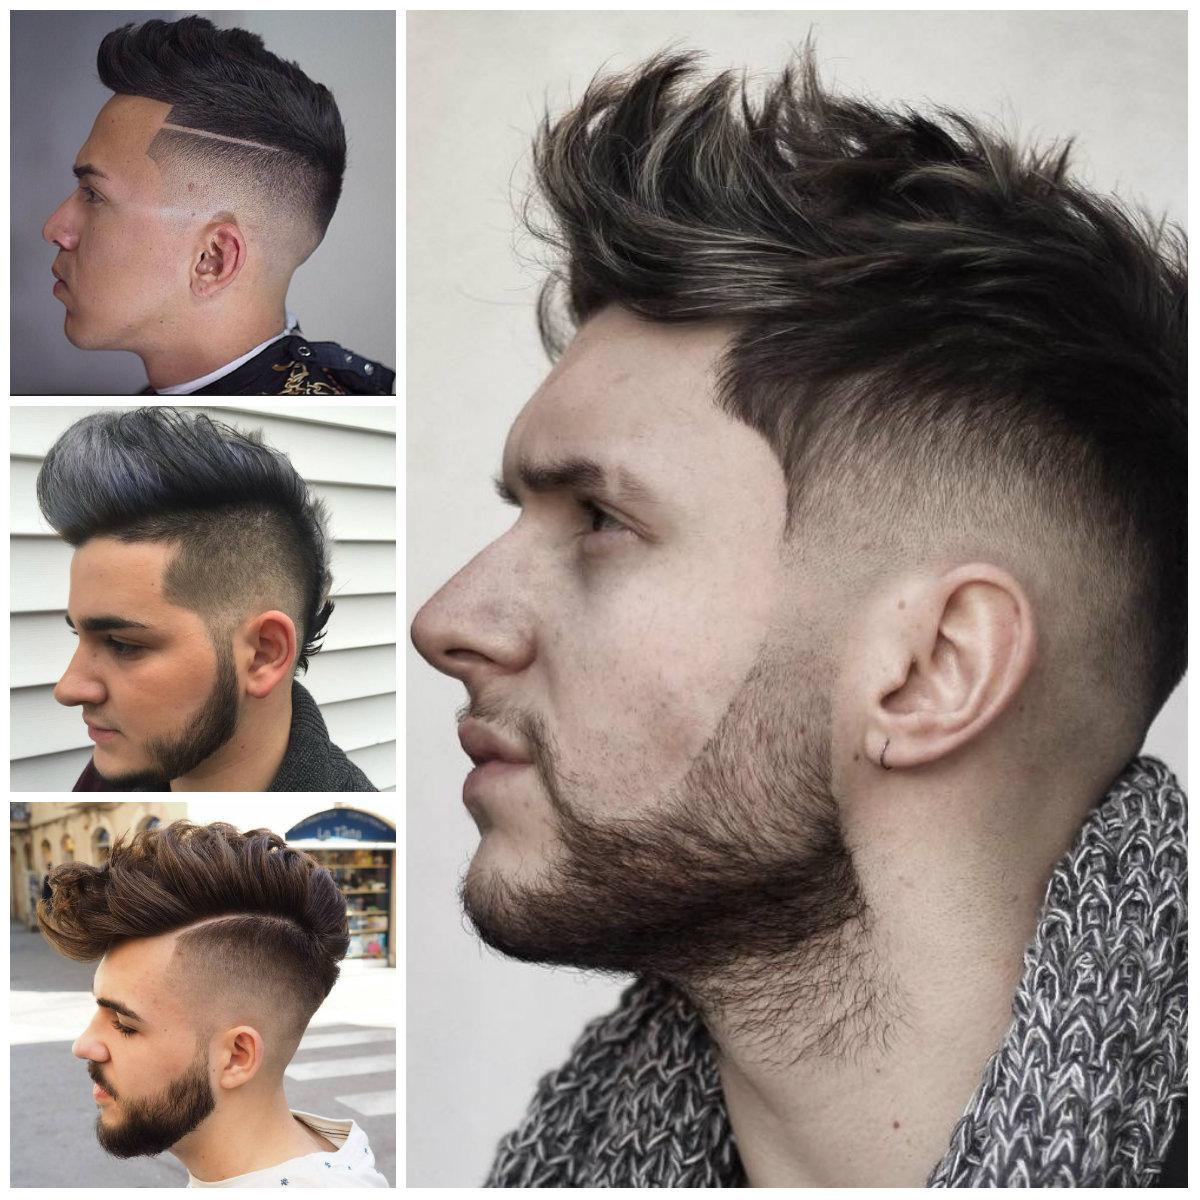 Men's Faux Hawk Hairstyles for 2017